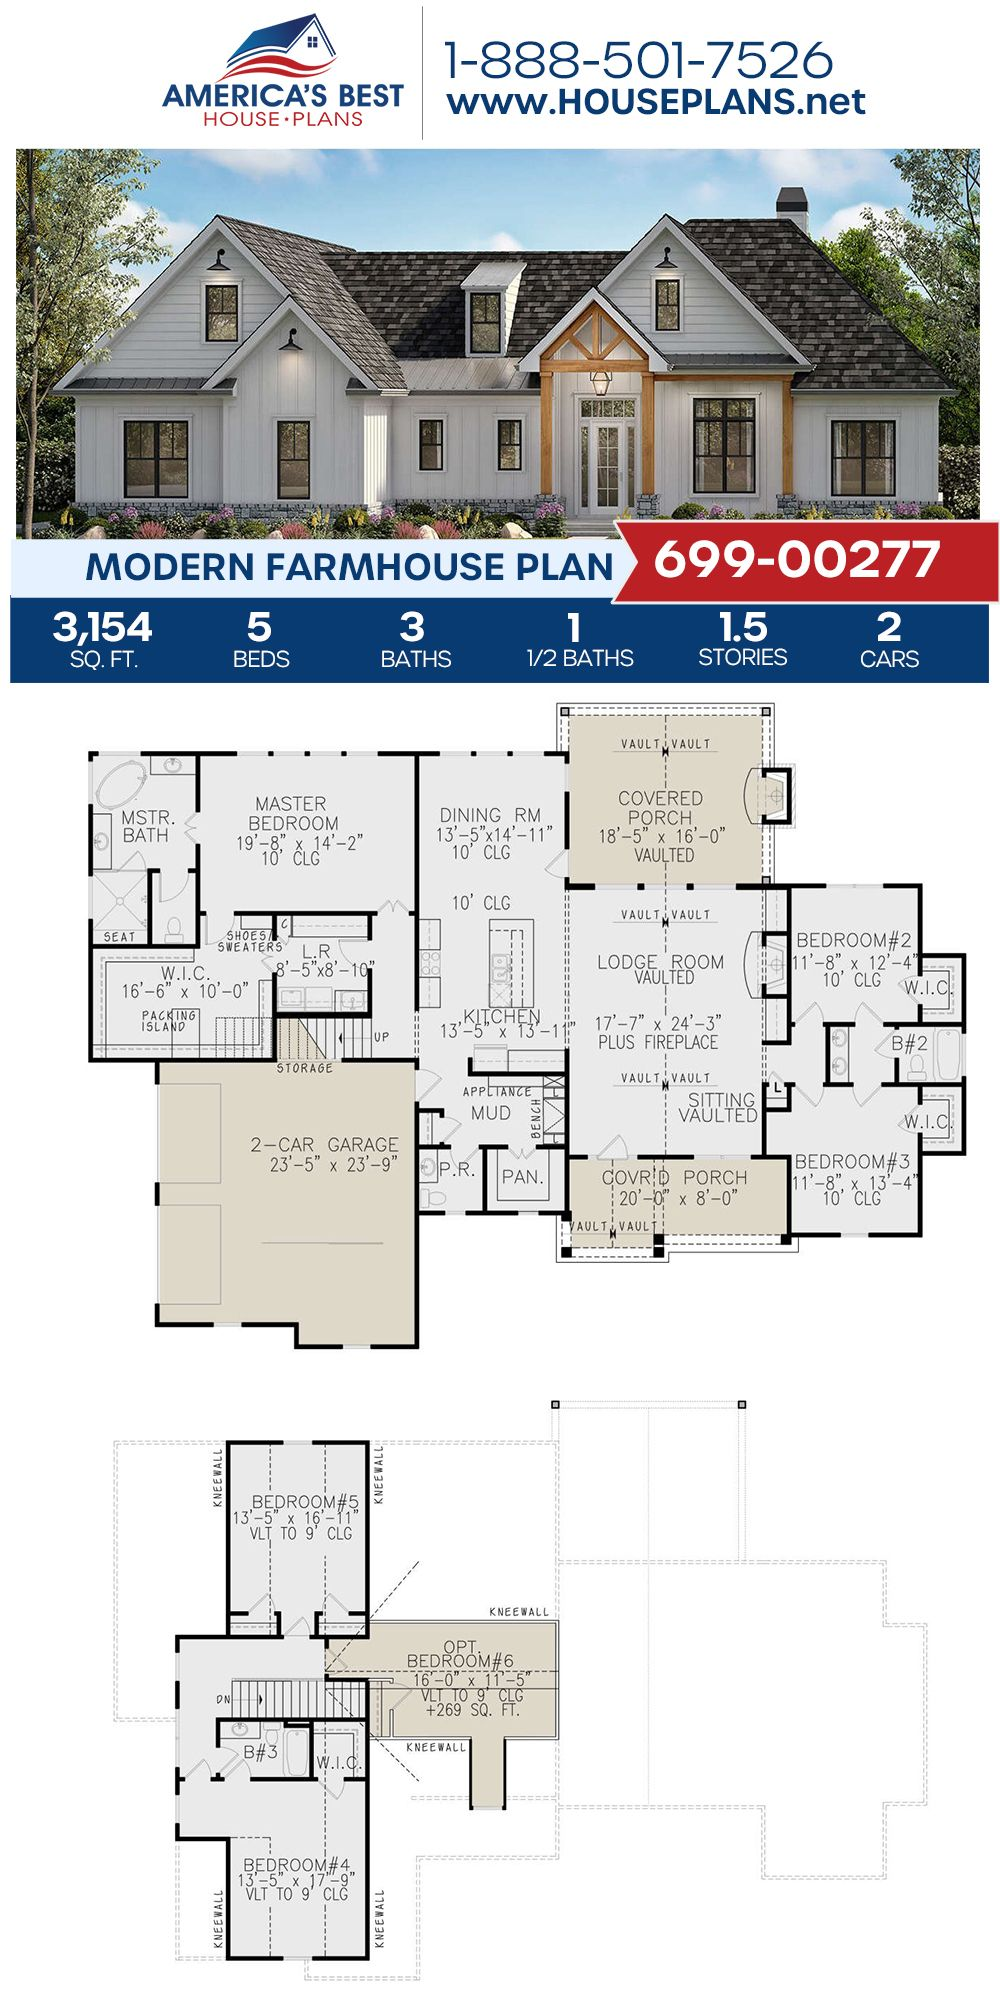 House Plan 699 00277 Modern Farmhouse Plan 3 154 Square Feet 5 Bedrooms 3 5 Bathrooms In 2020 Modern Farmhouse Plans Modern Farmhouse Floors Farmhouse Plans